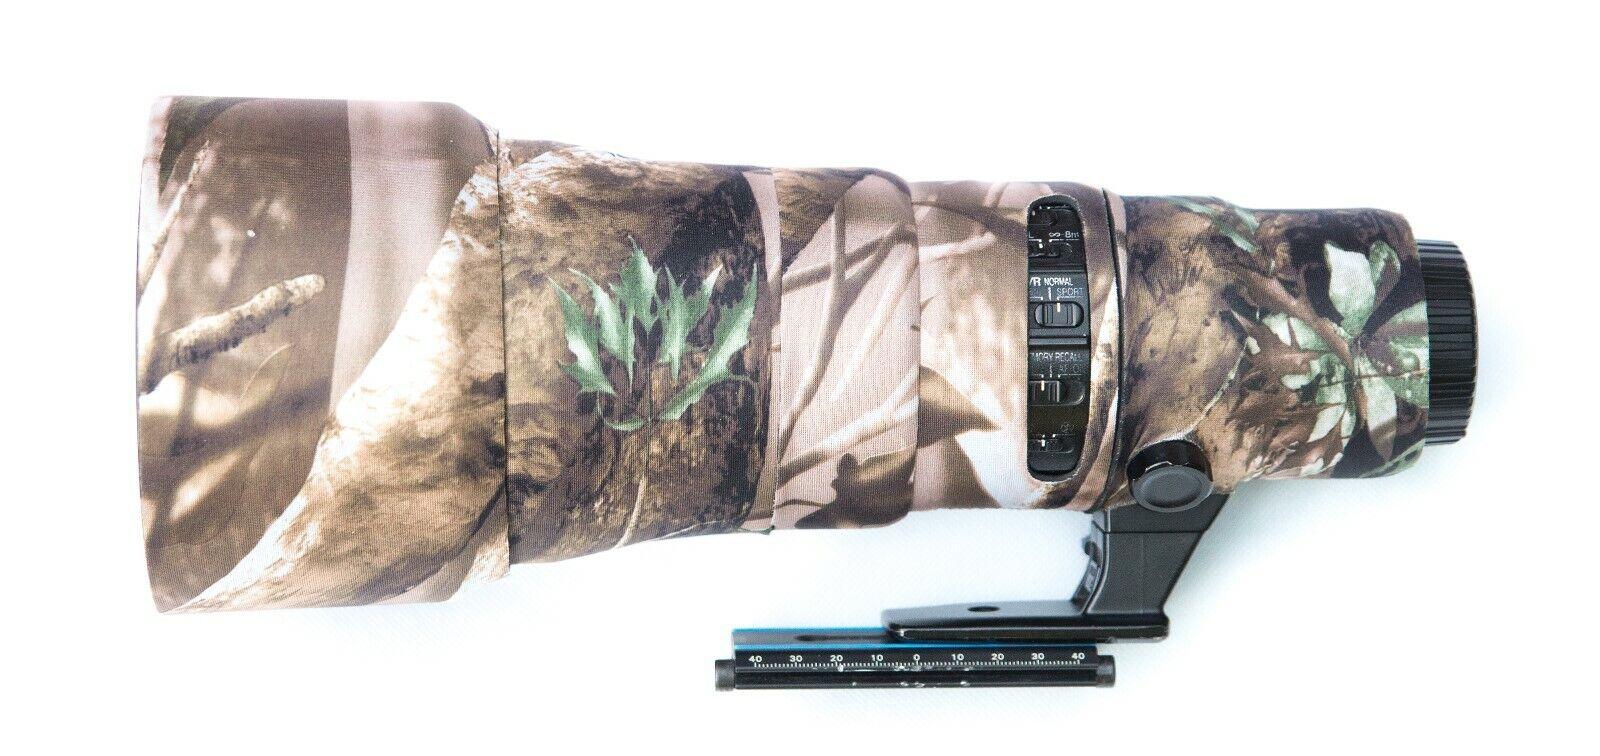 Camouflage Lens Cover for Nikon 500mm f/5.6E PF ED VR ( Neoprene Camo )